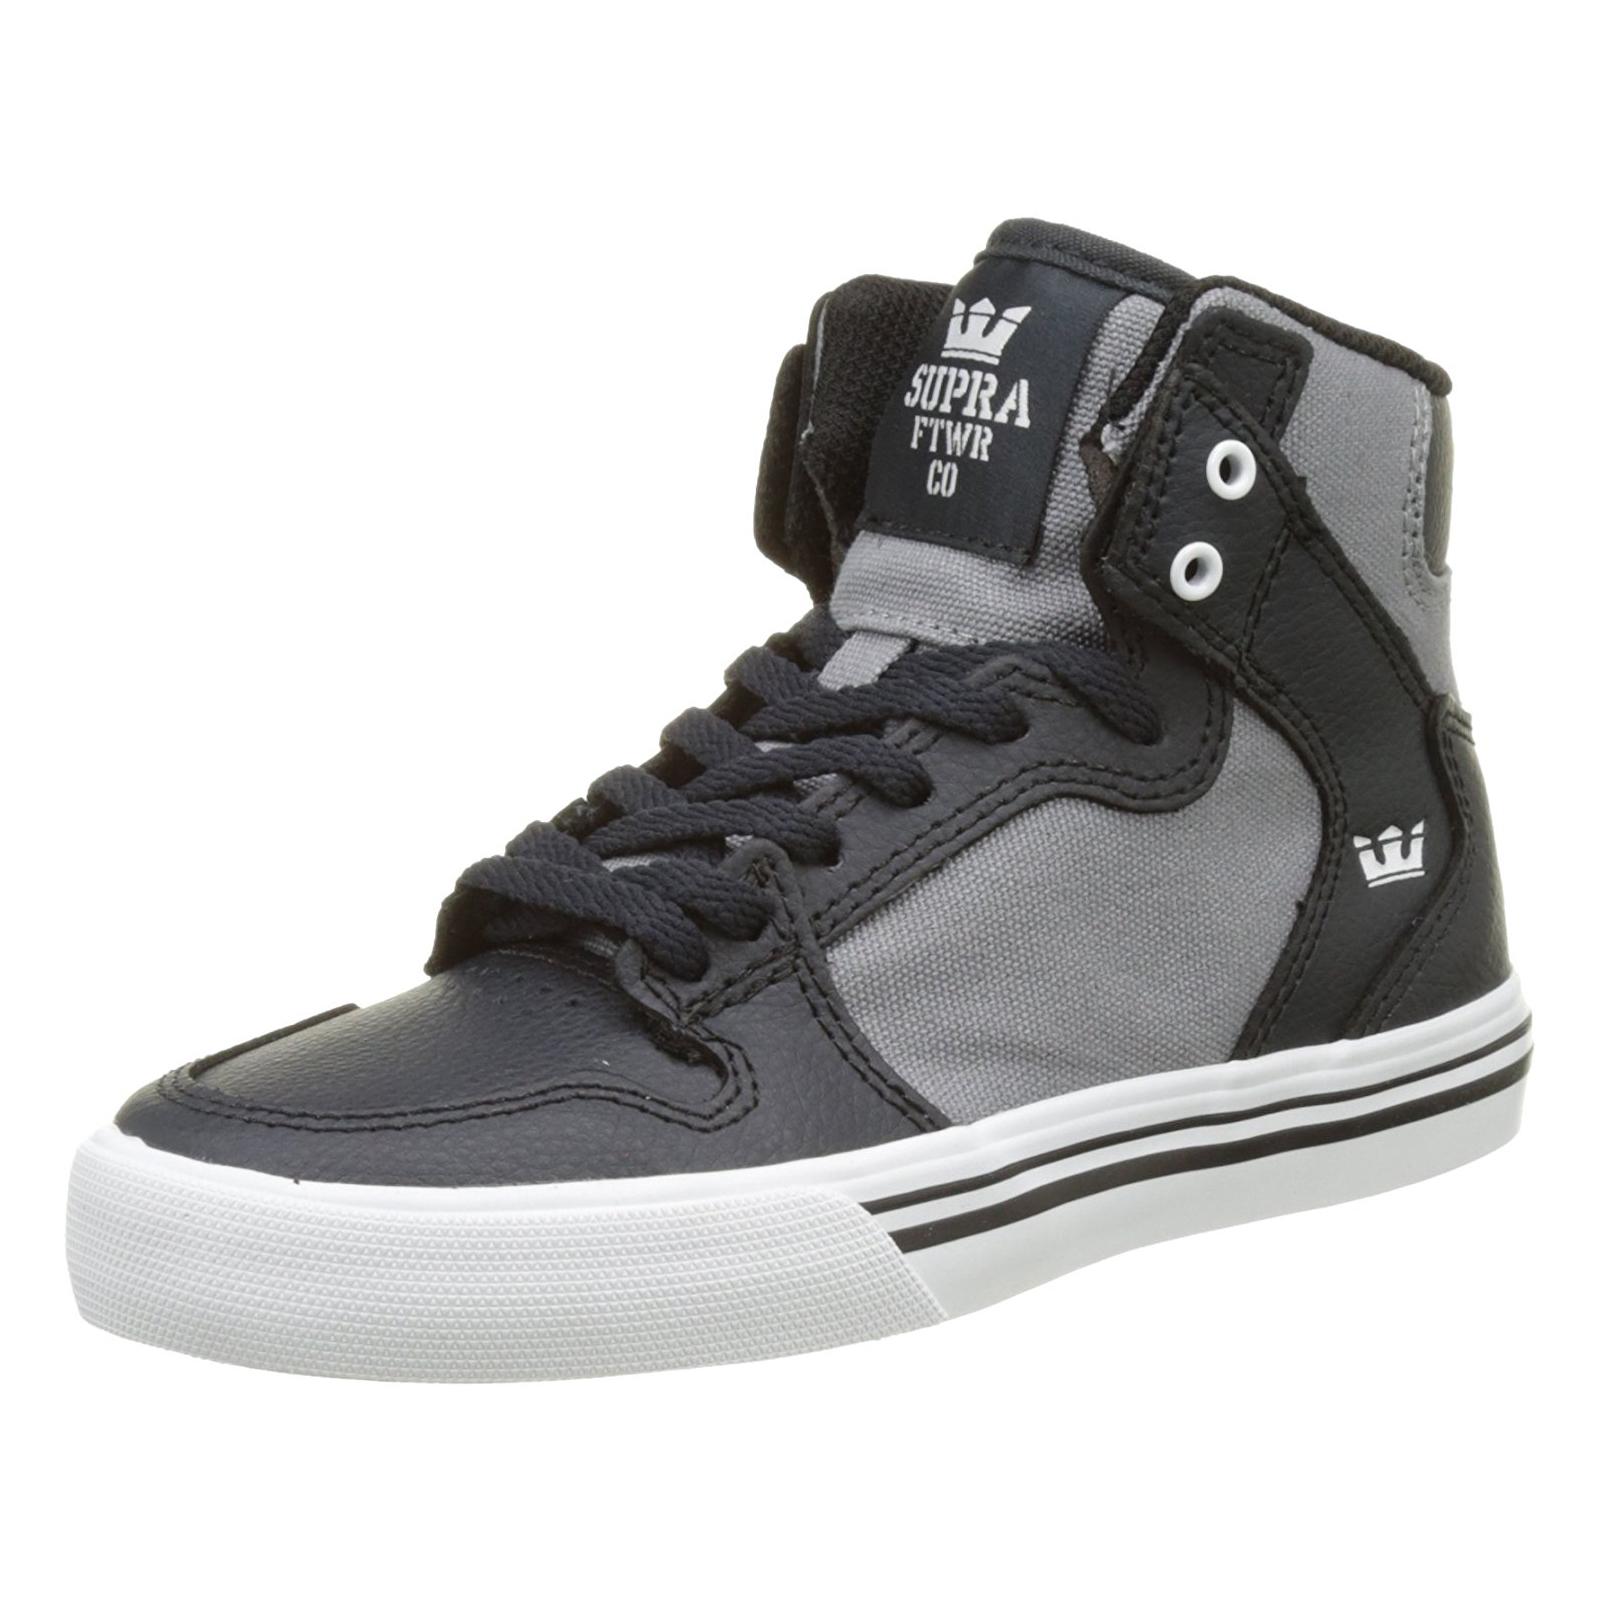 26ebc299a3bb Supra Sneakers Kids Vaider Dk. Grey Grey-White Cornerstone grey